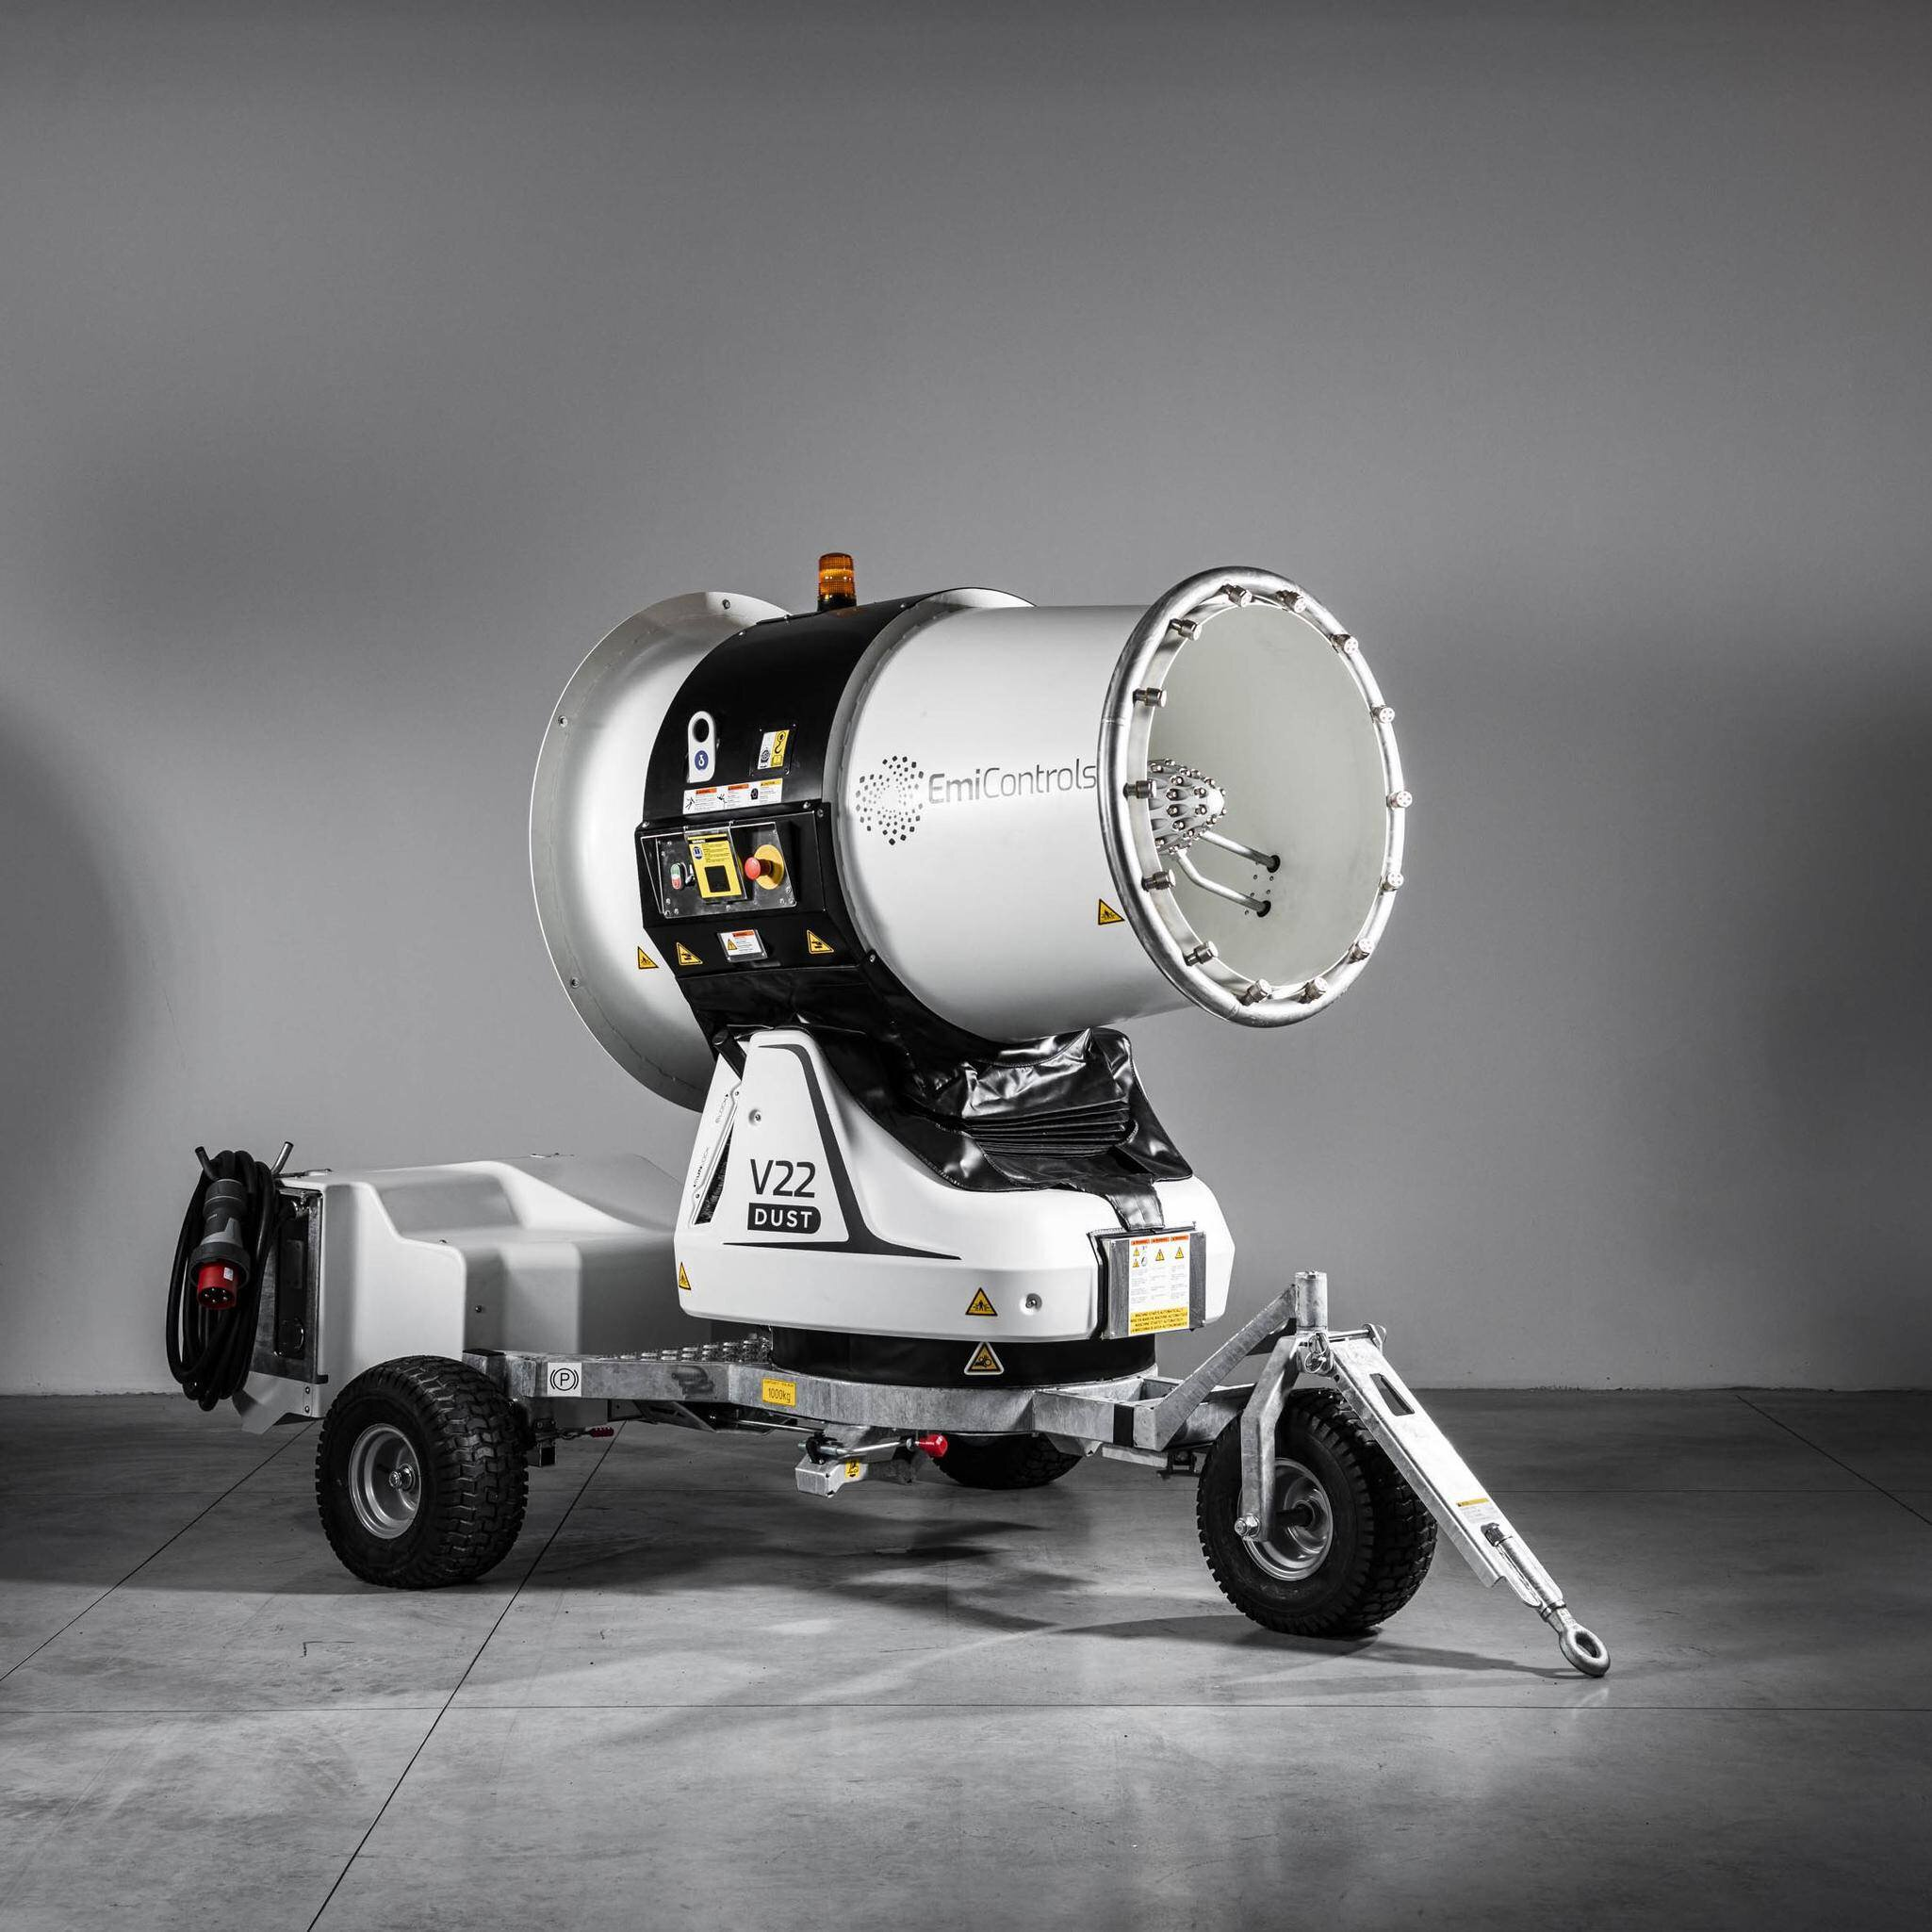 Solution image of V22 Dust Controller